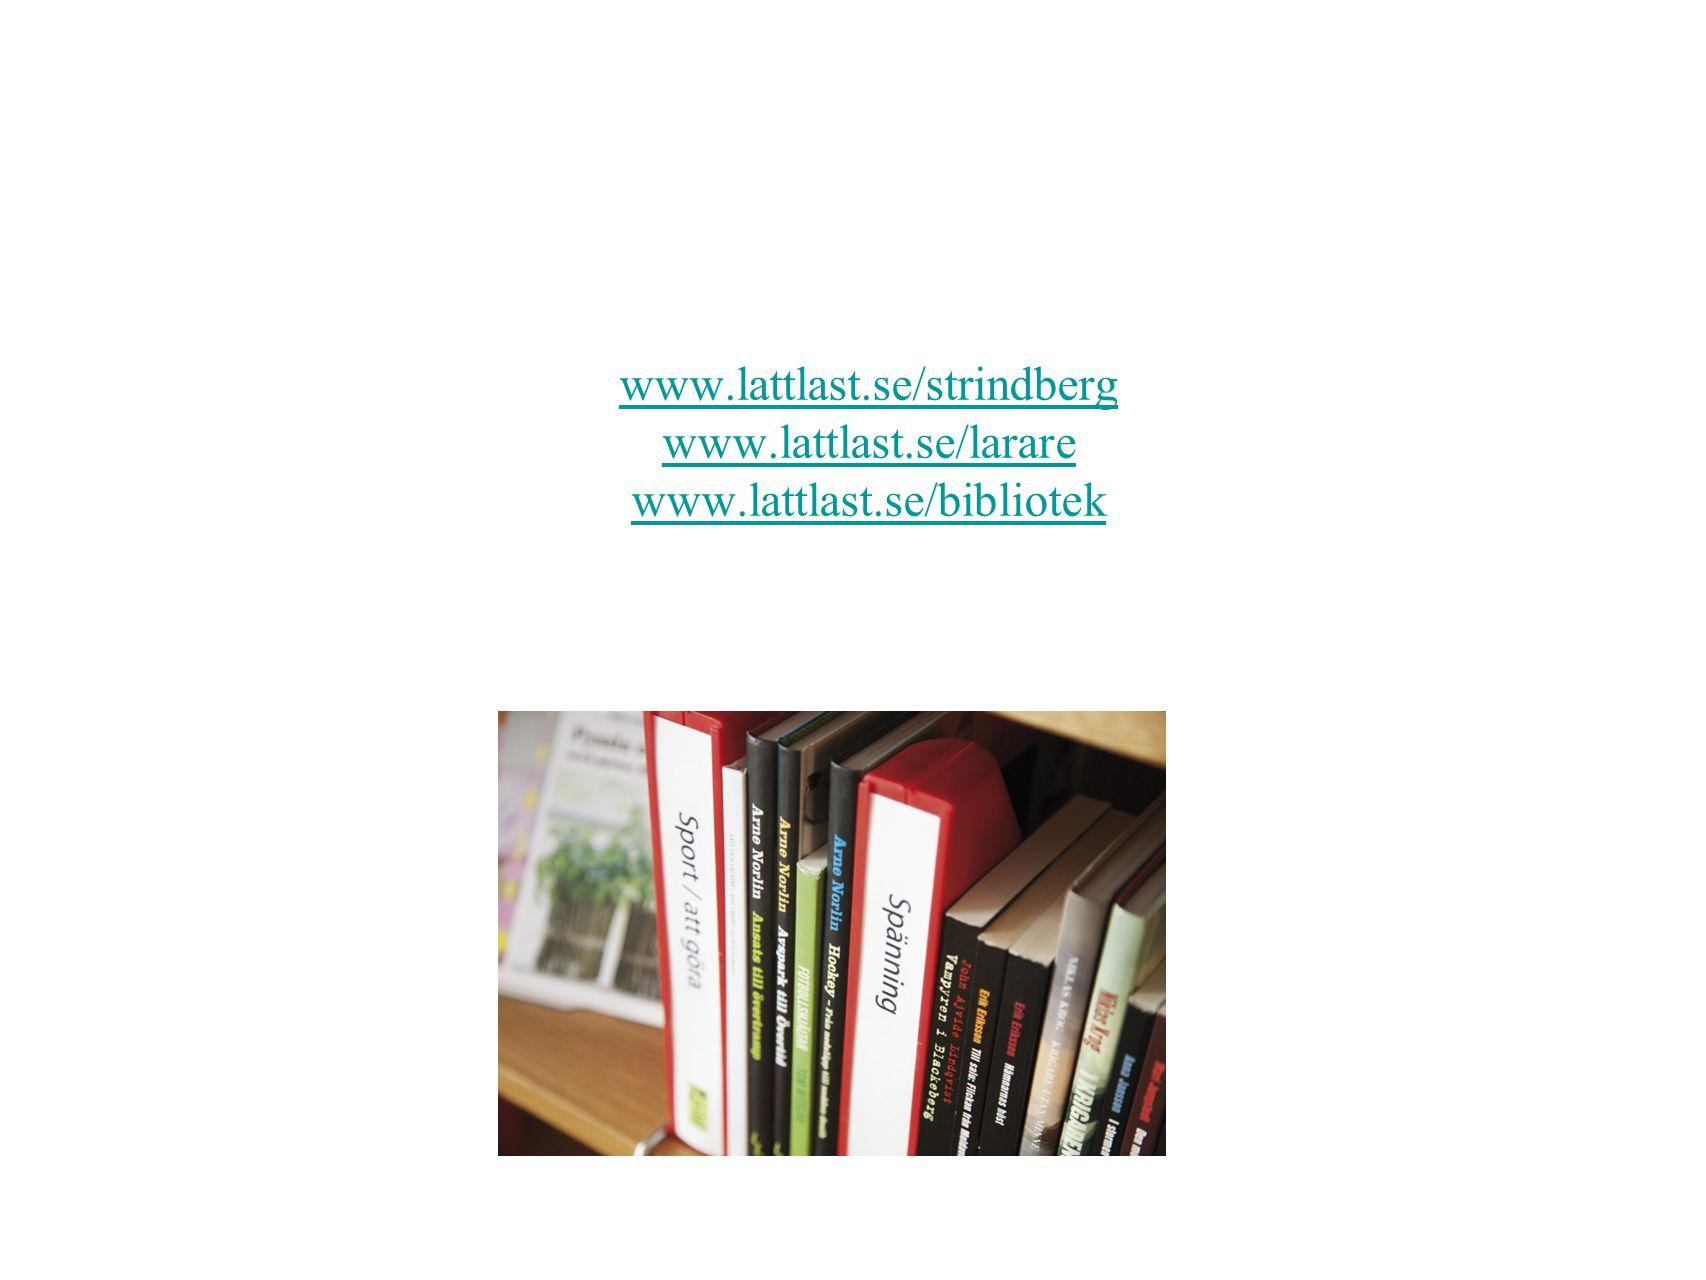 www.lattlast.se/strindberg www.lattlast.se/larare www.lattlast.se/bibliotek